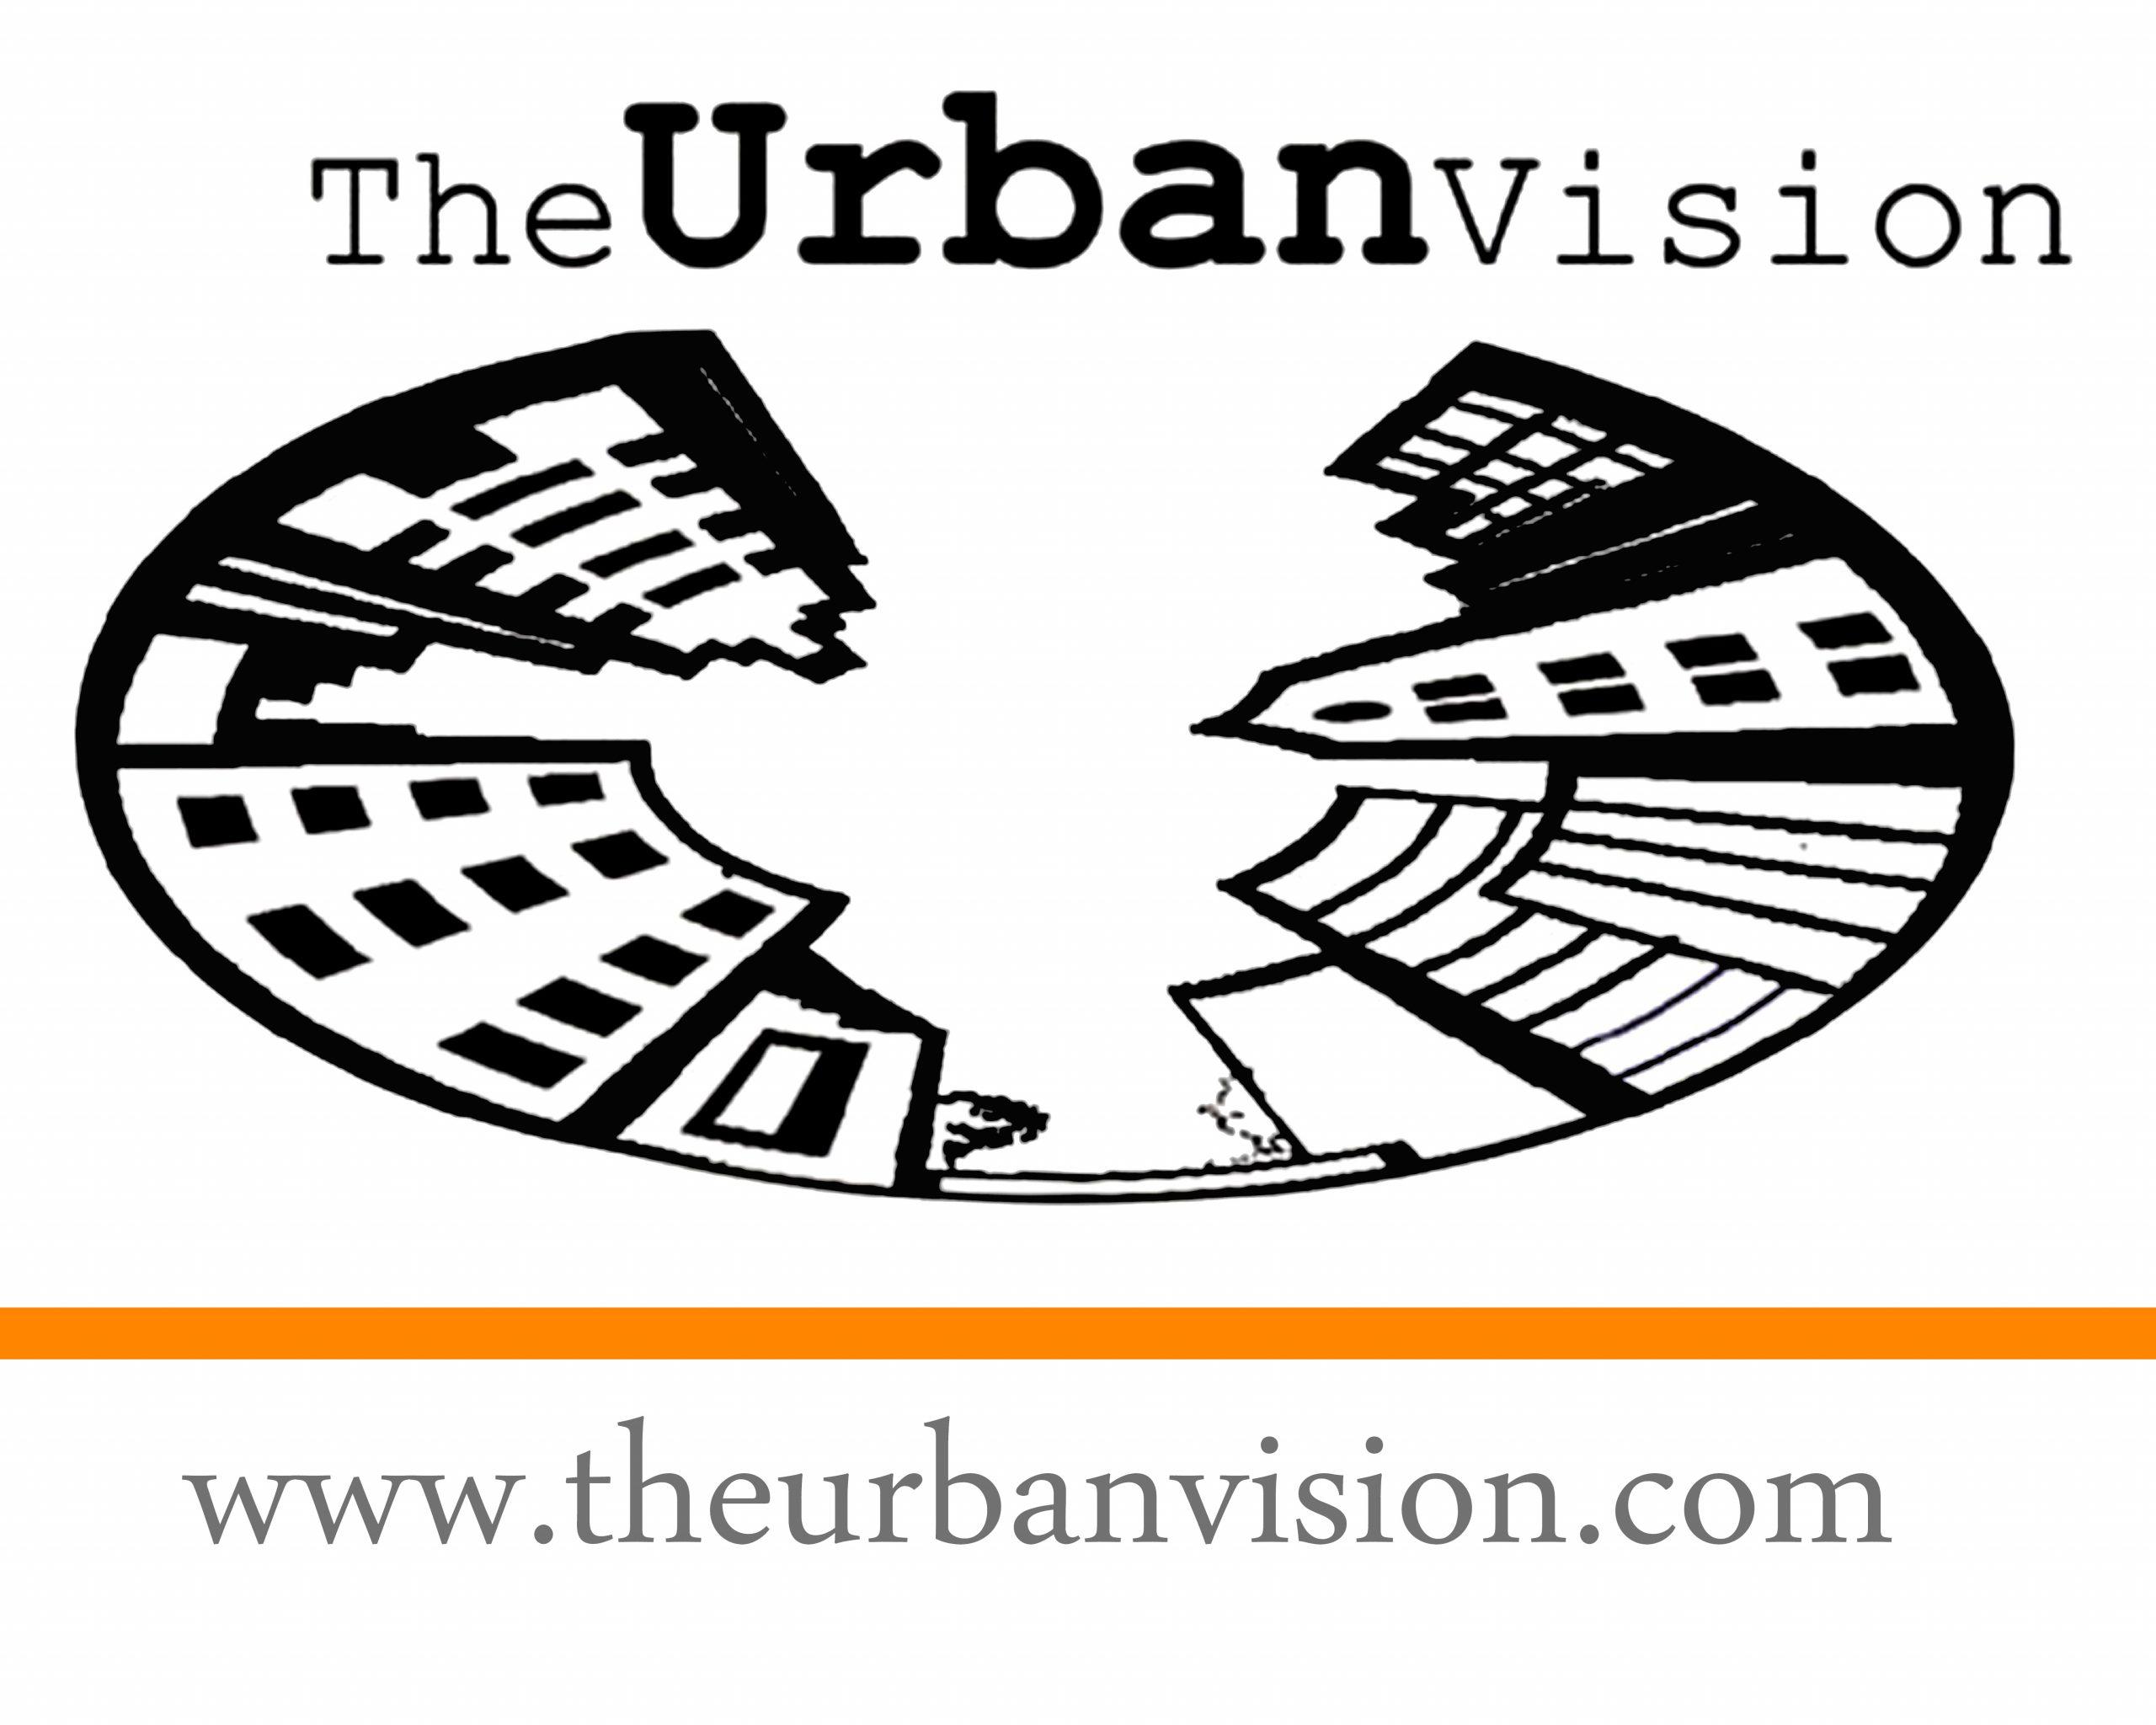 The Urban Vision